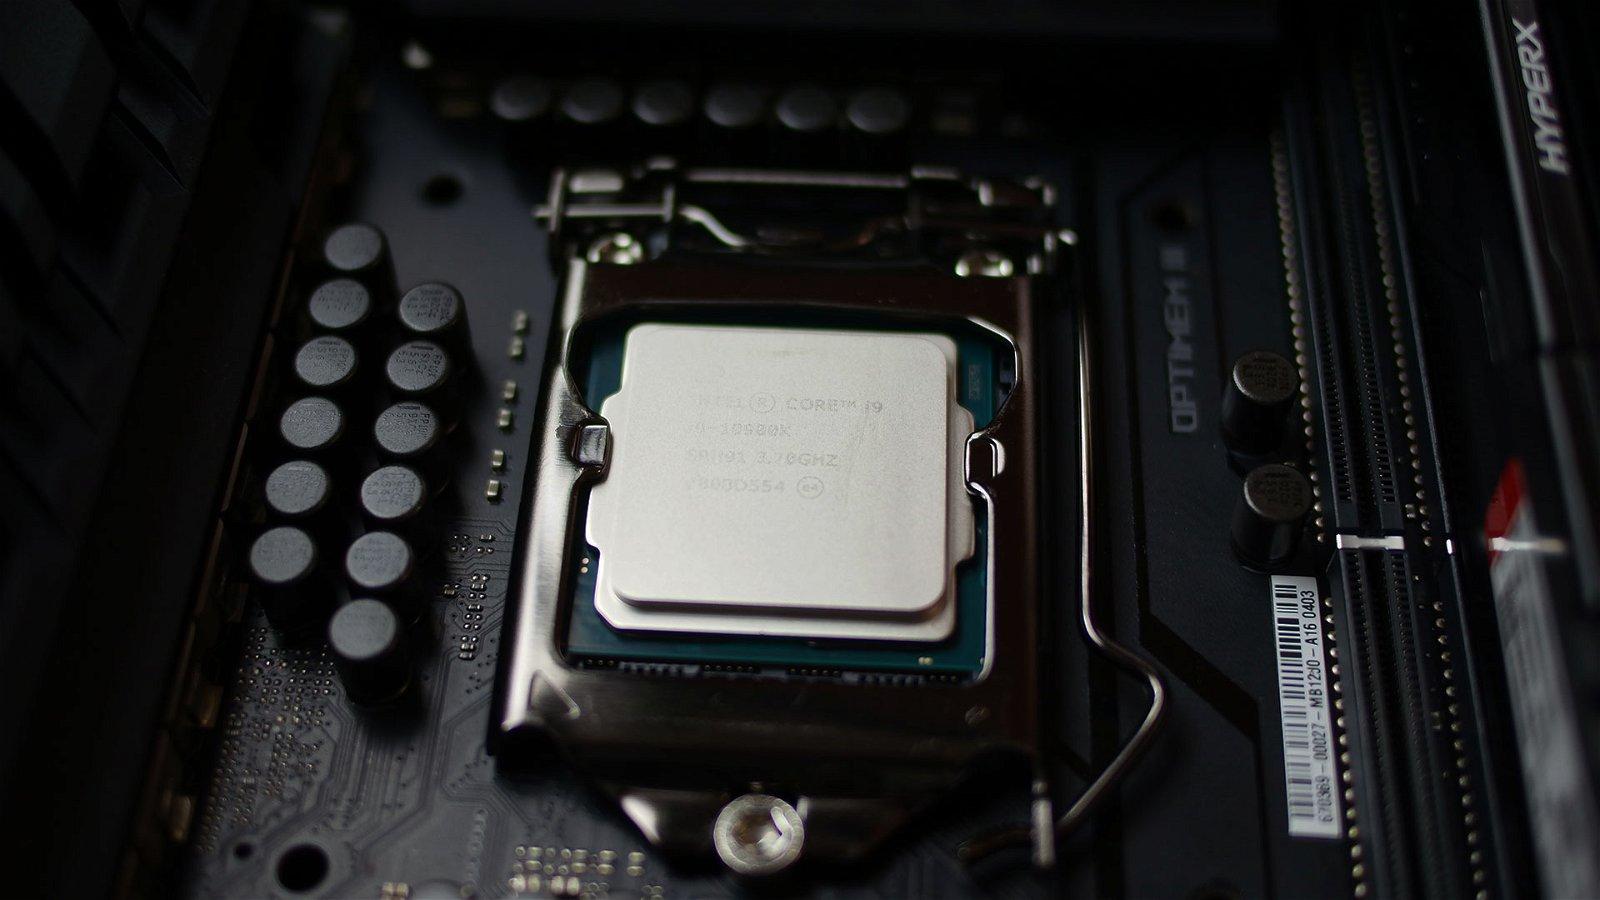 Intel Core i9-10900K (Hardware) Review 8